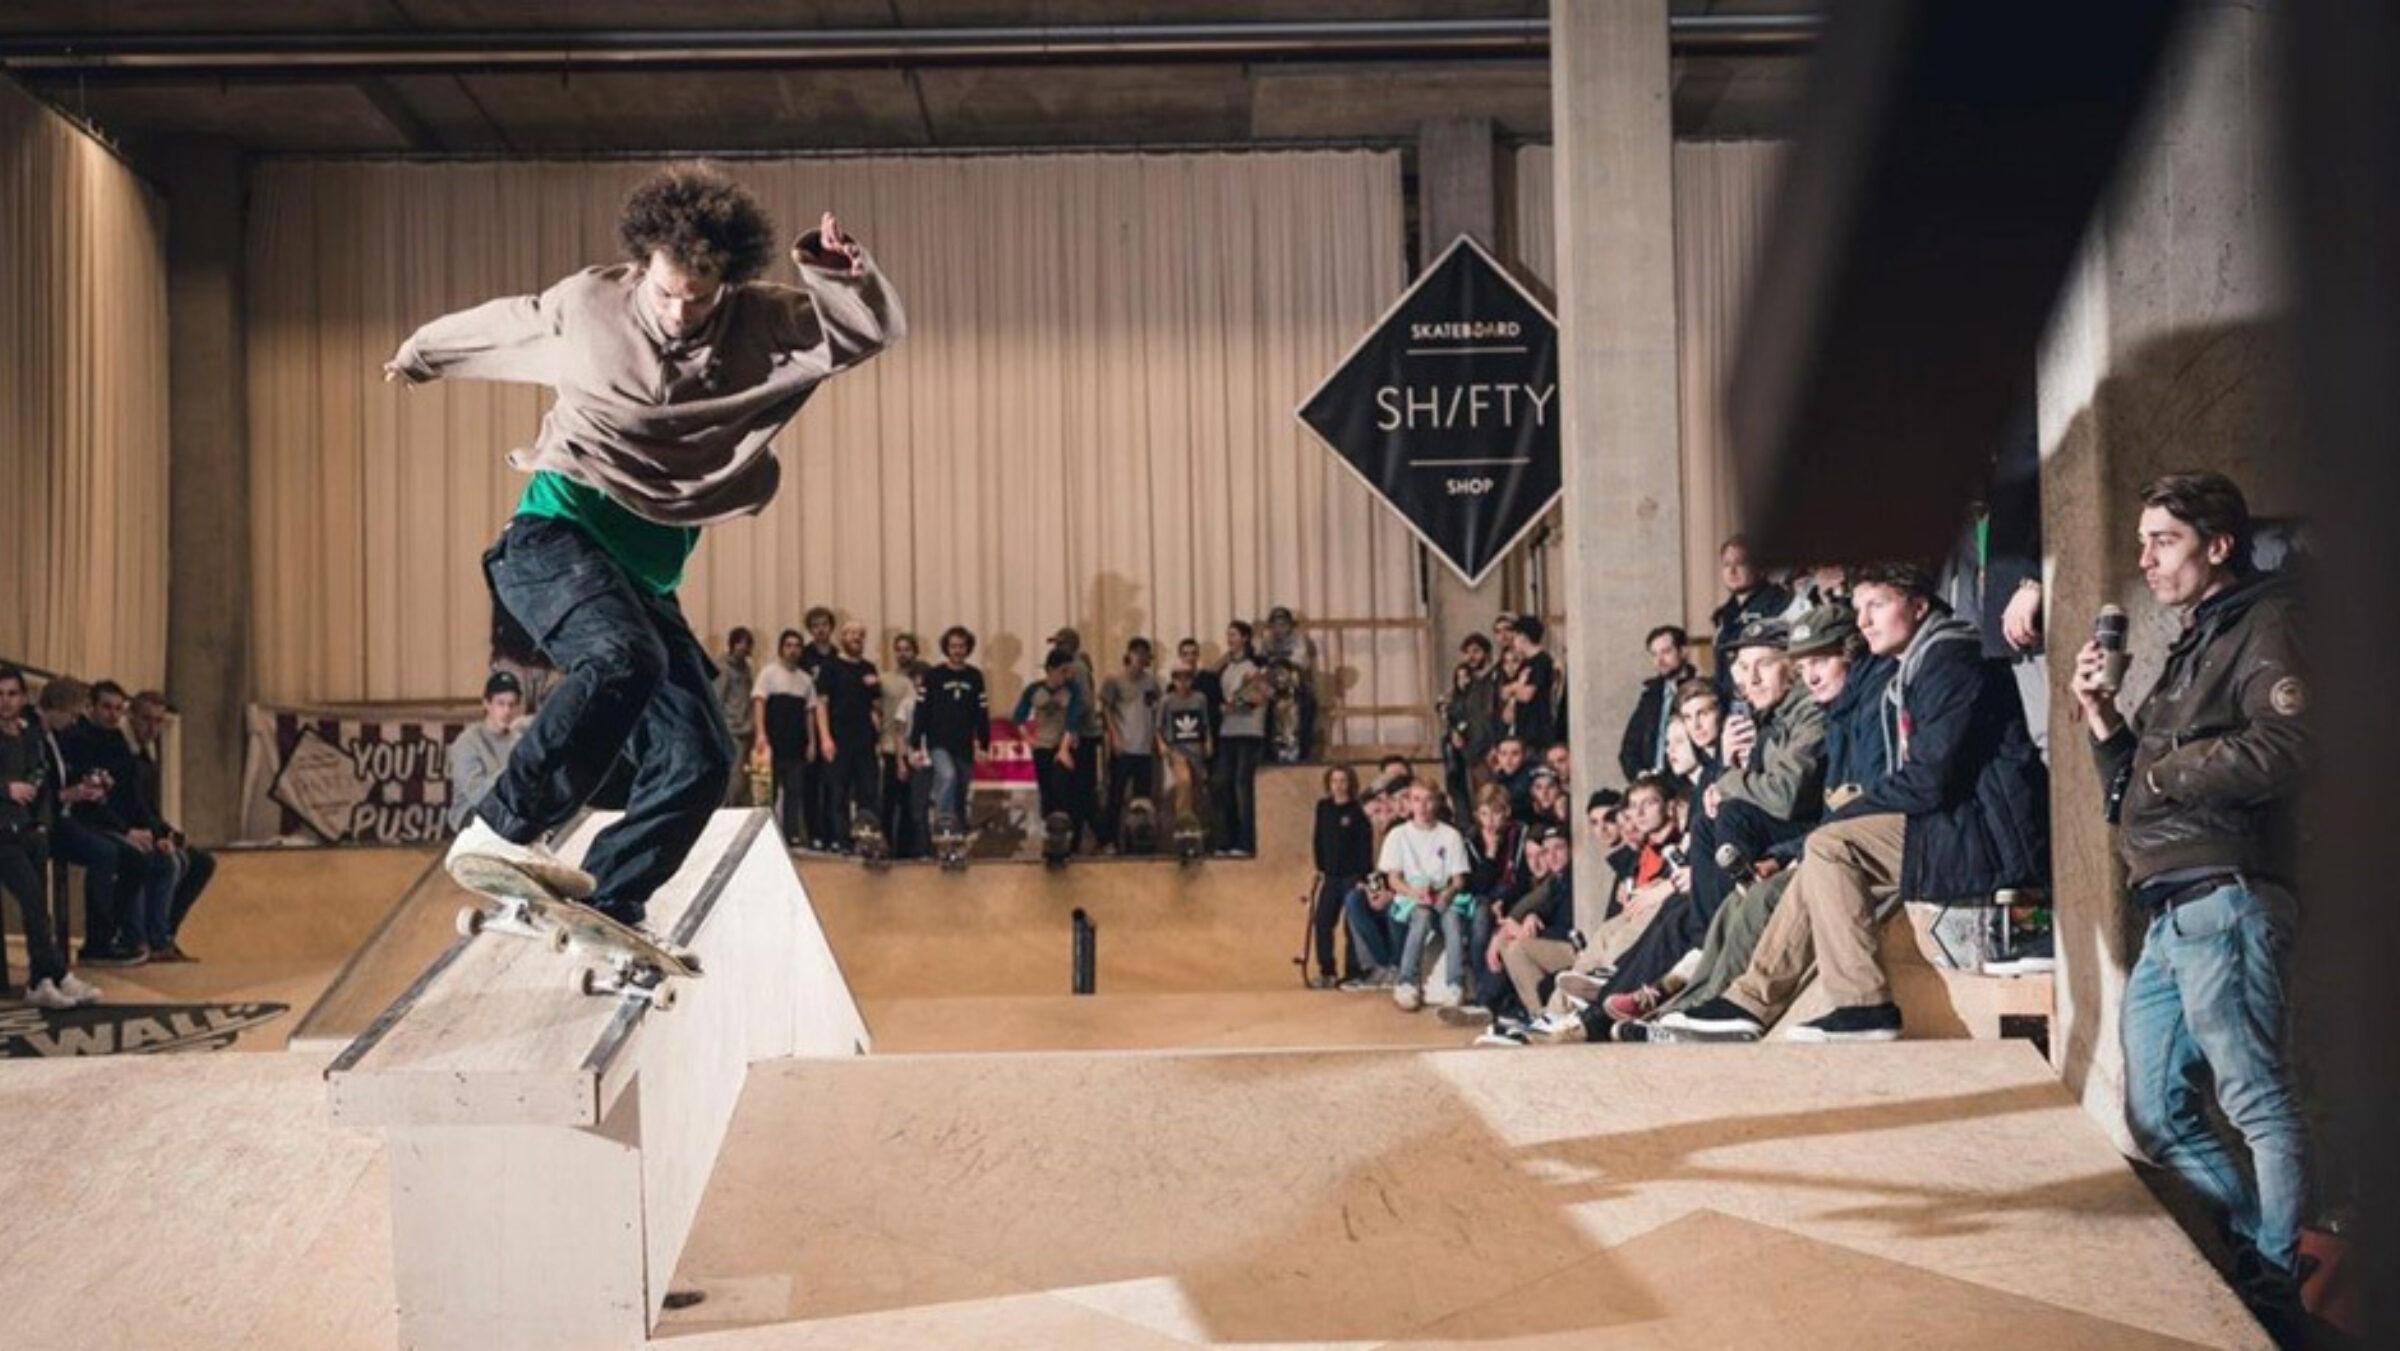 Internationaal skateboard contest